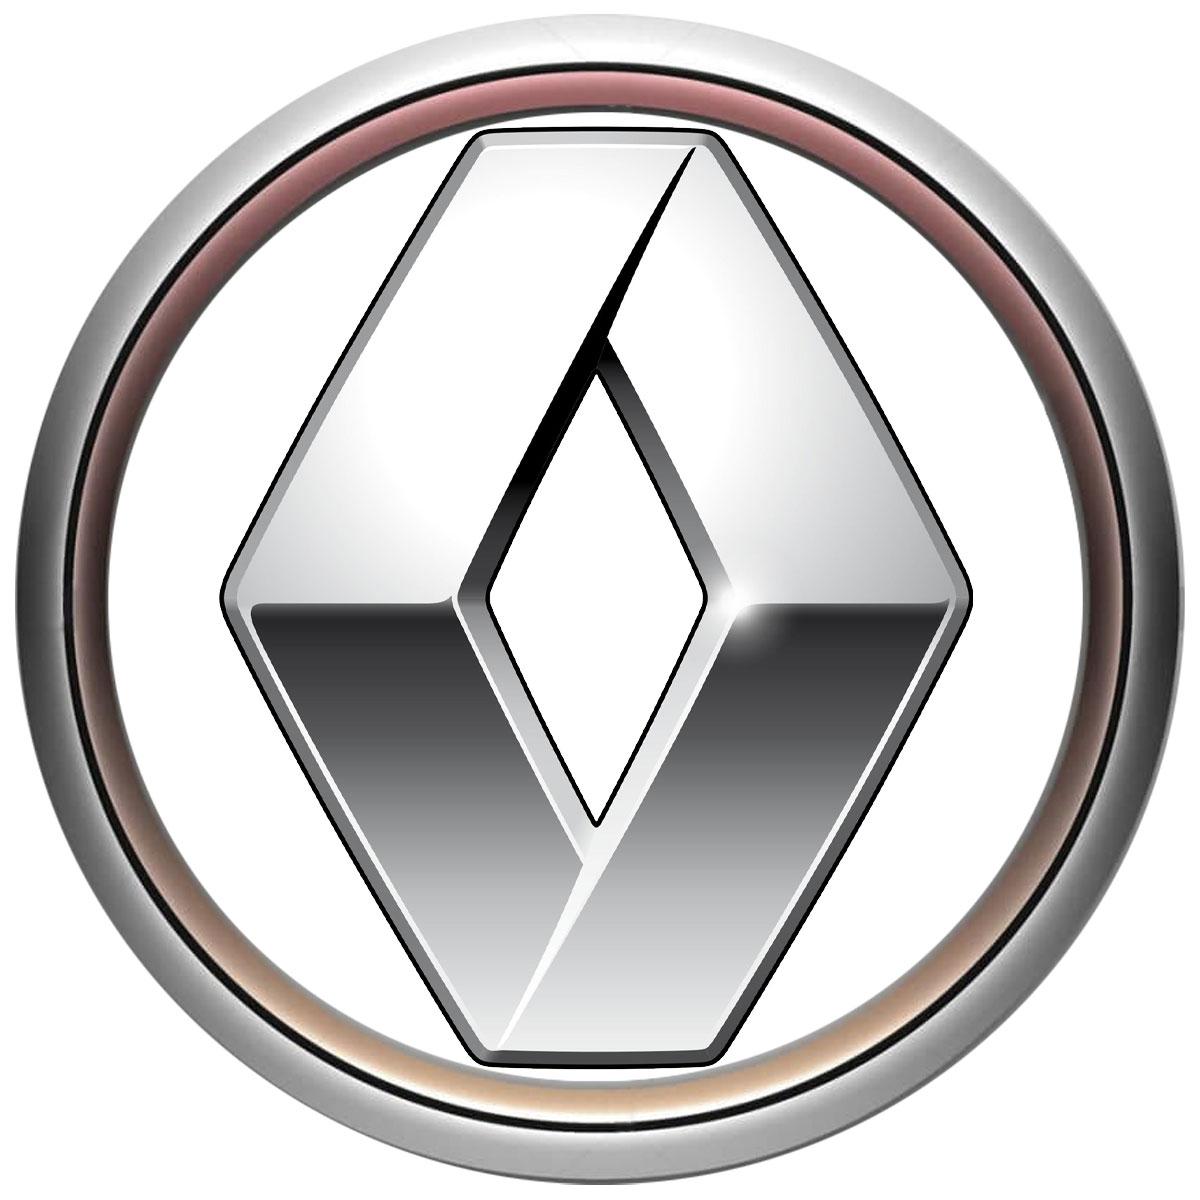 renult logo